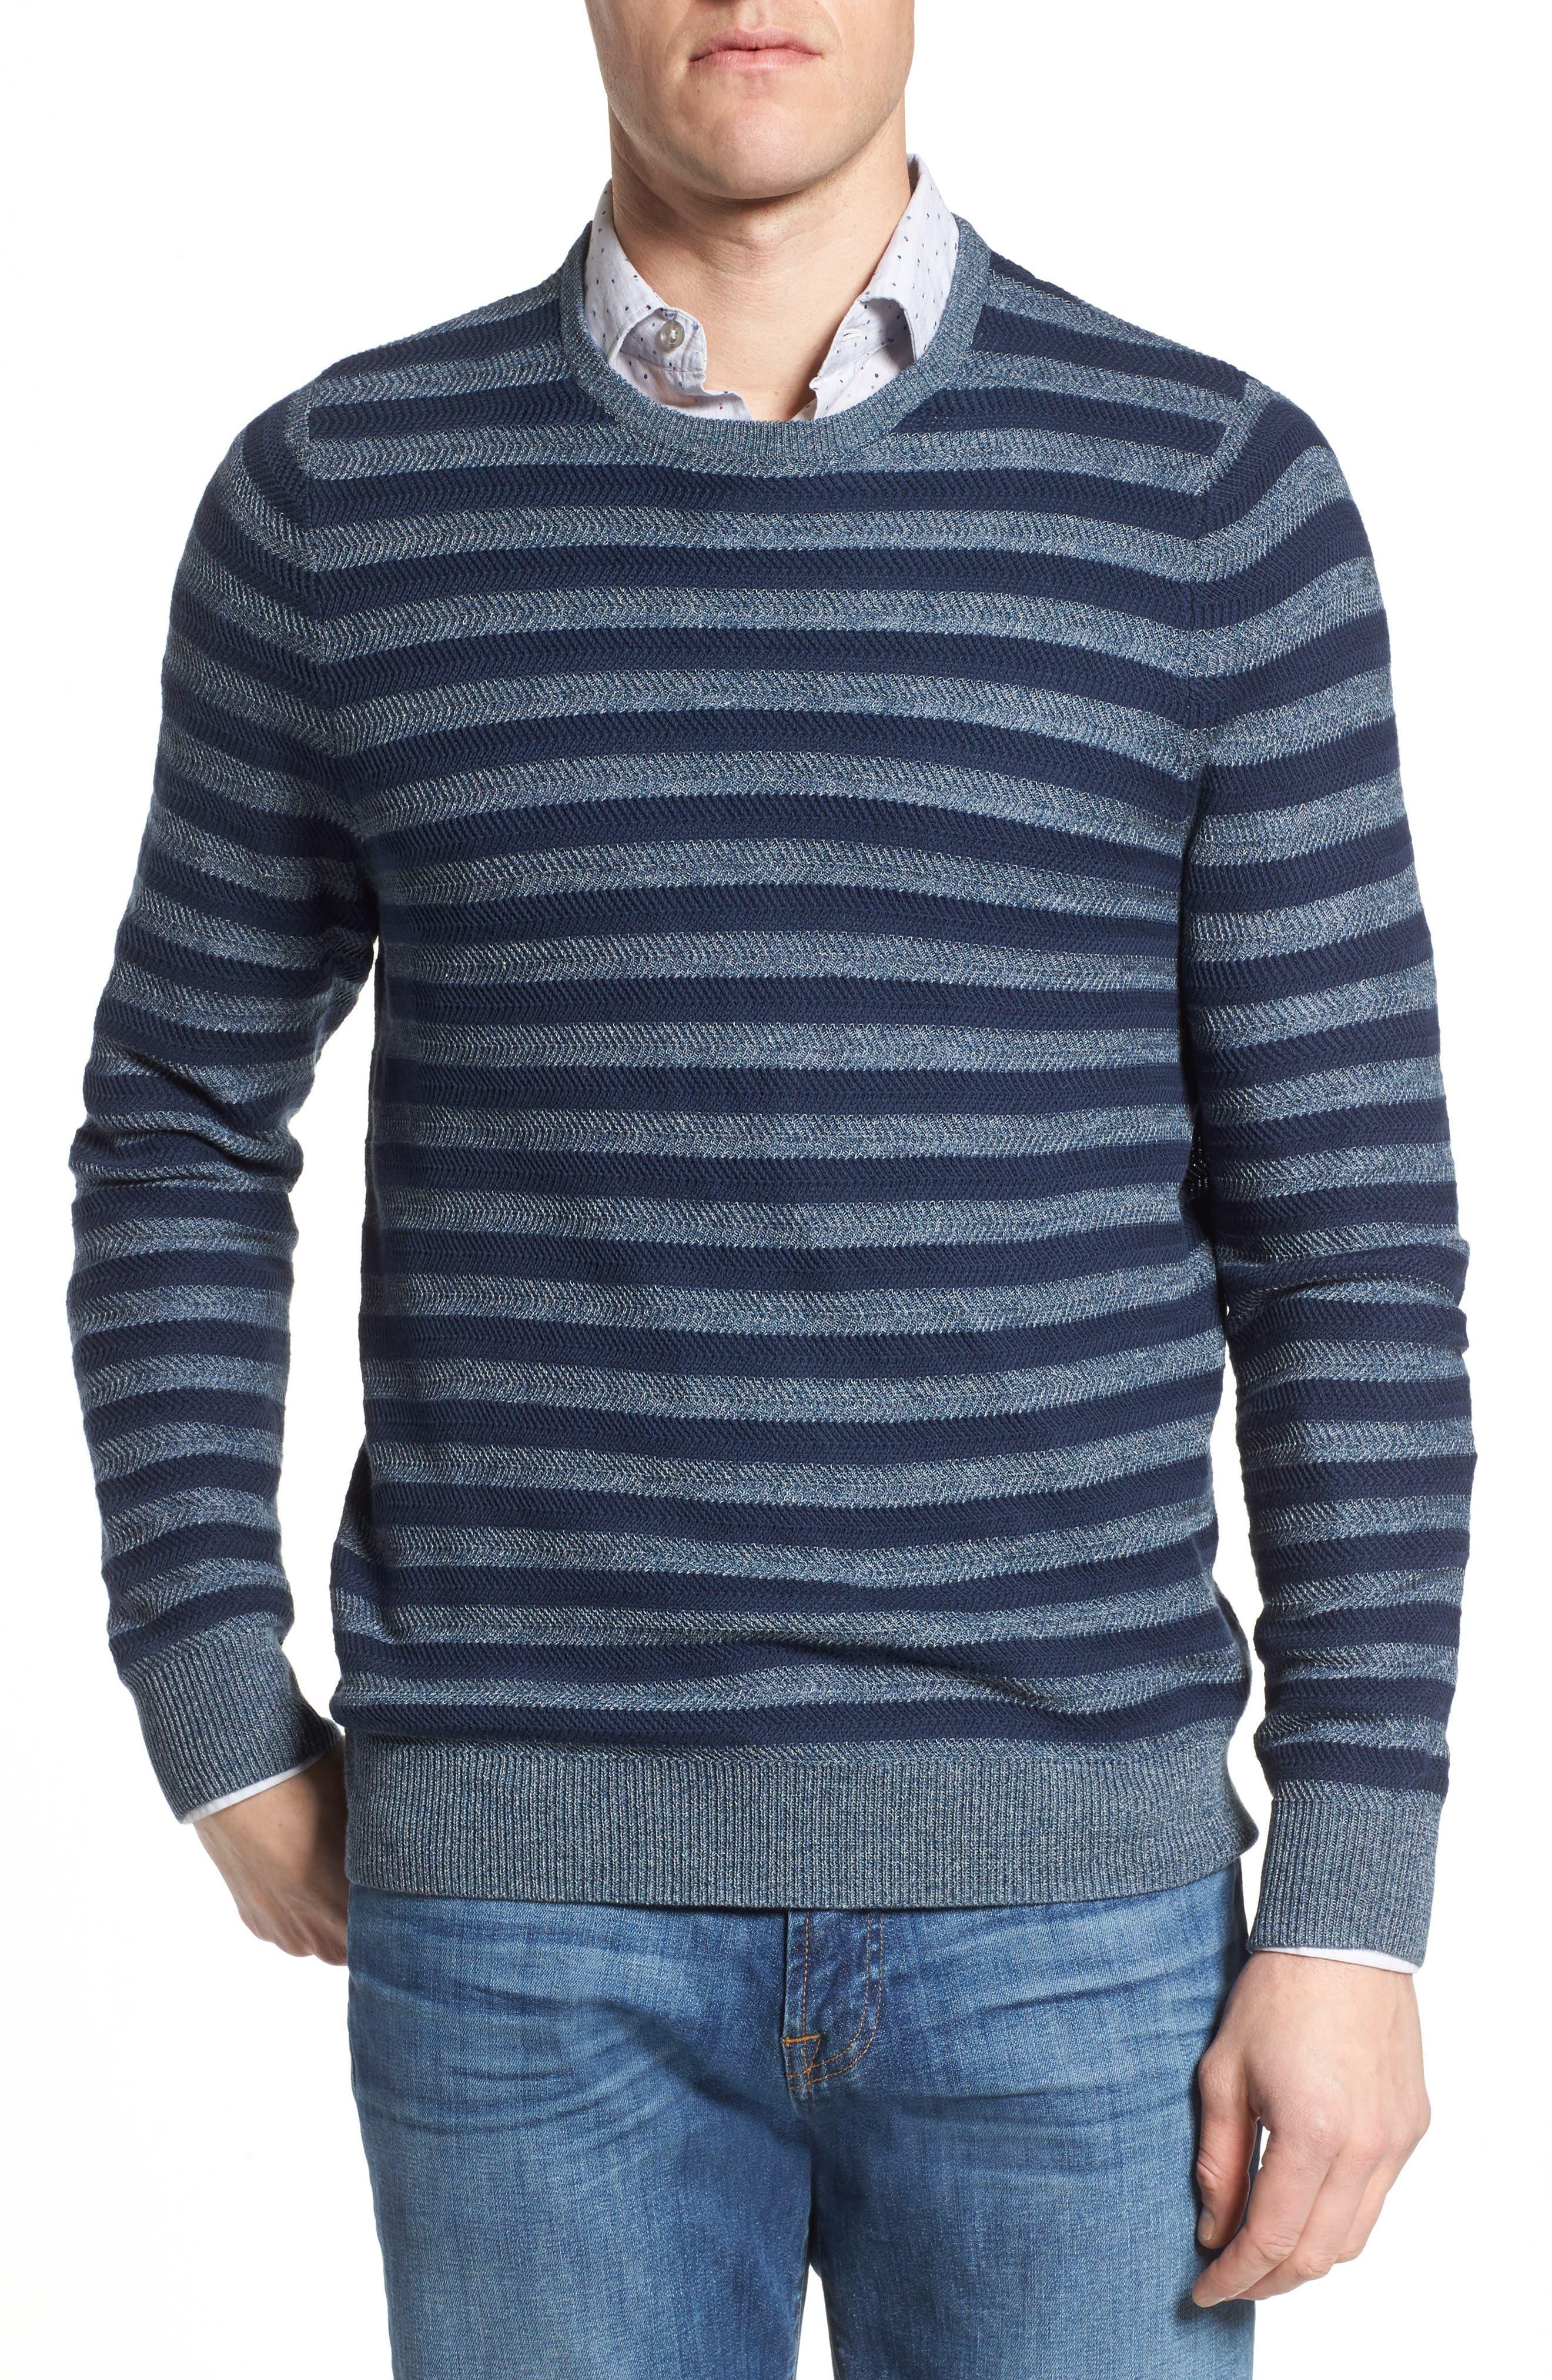 Stripe Cotton Blend Sweater,                             Main thumbnail 1, color,                             Navy Iris Stripe